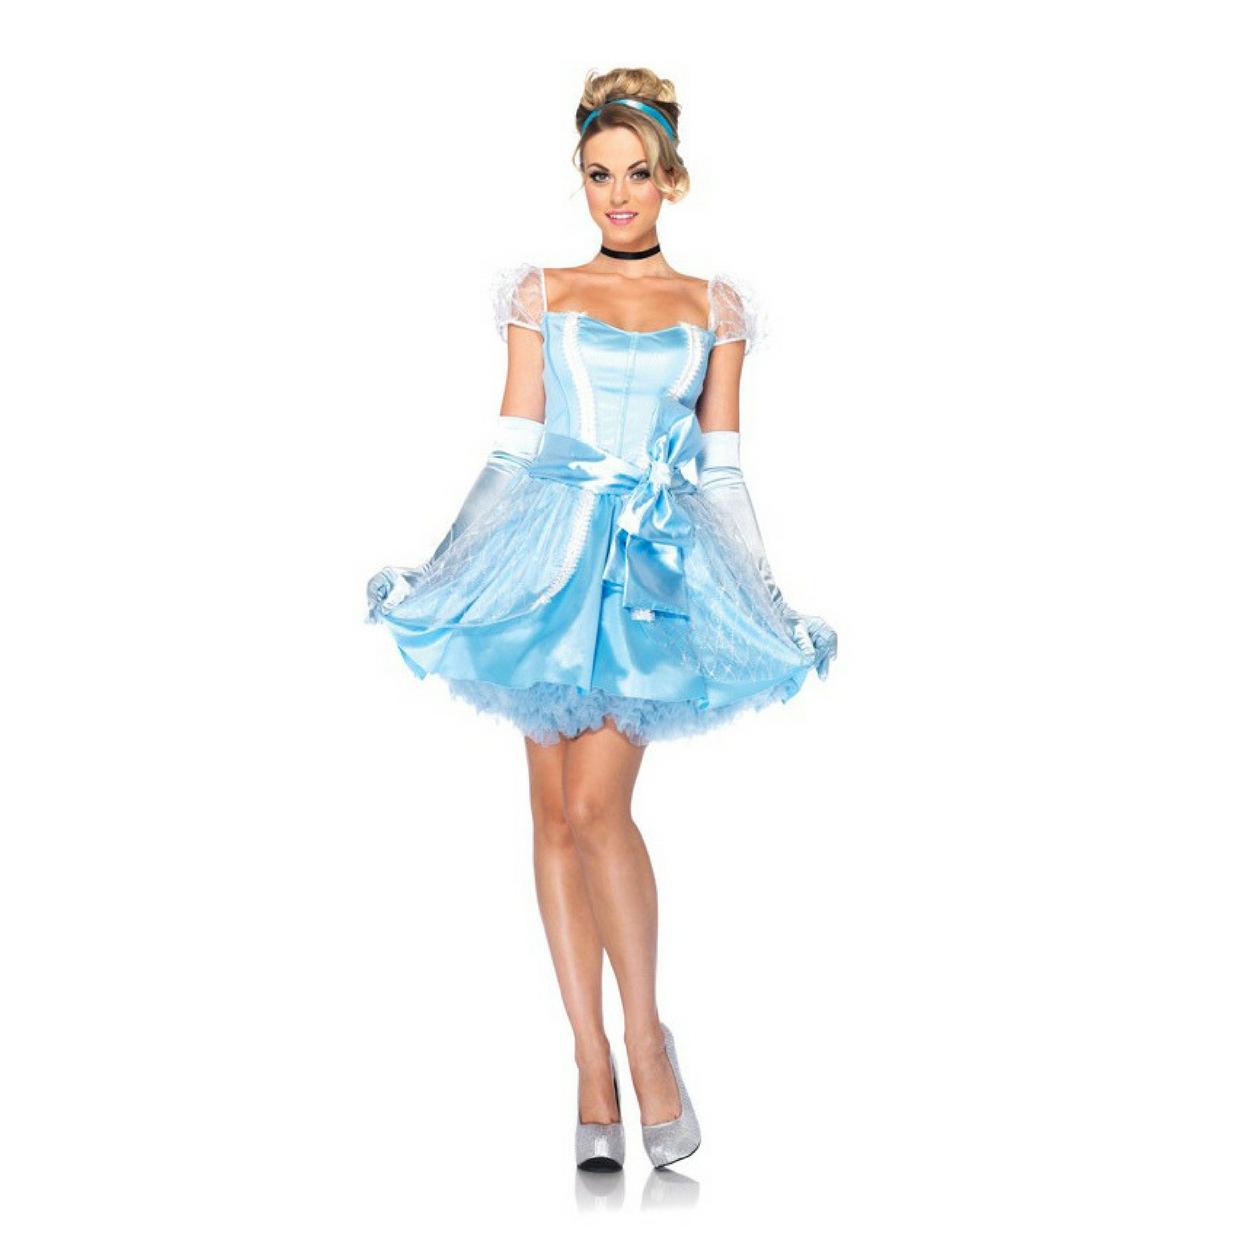 f97ca6aac Fantasia Cinderela Luxo Encantada Fantasias - Aluguel de fantasia online!